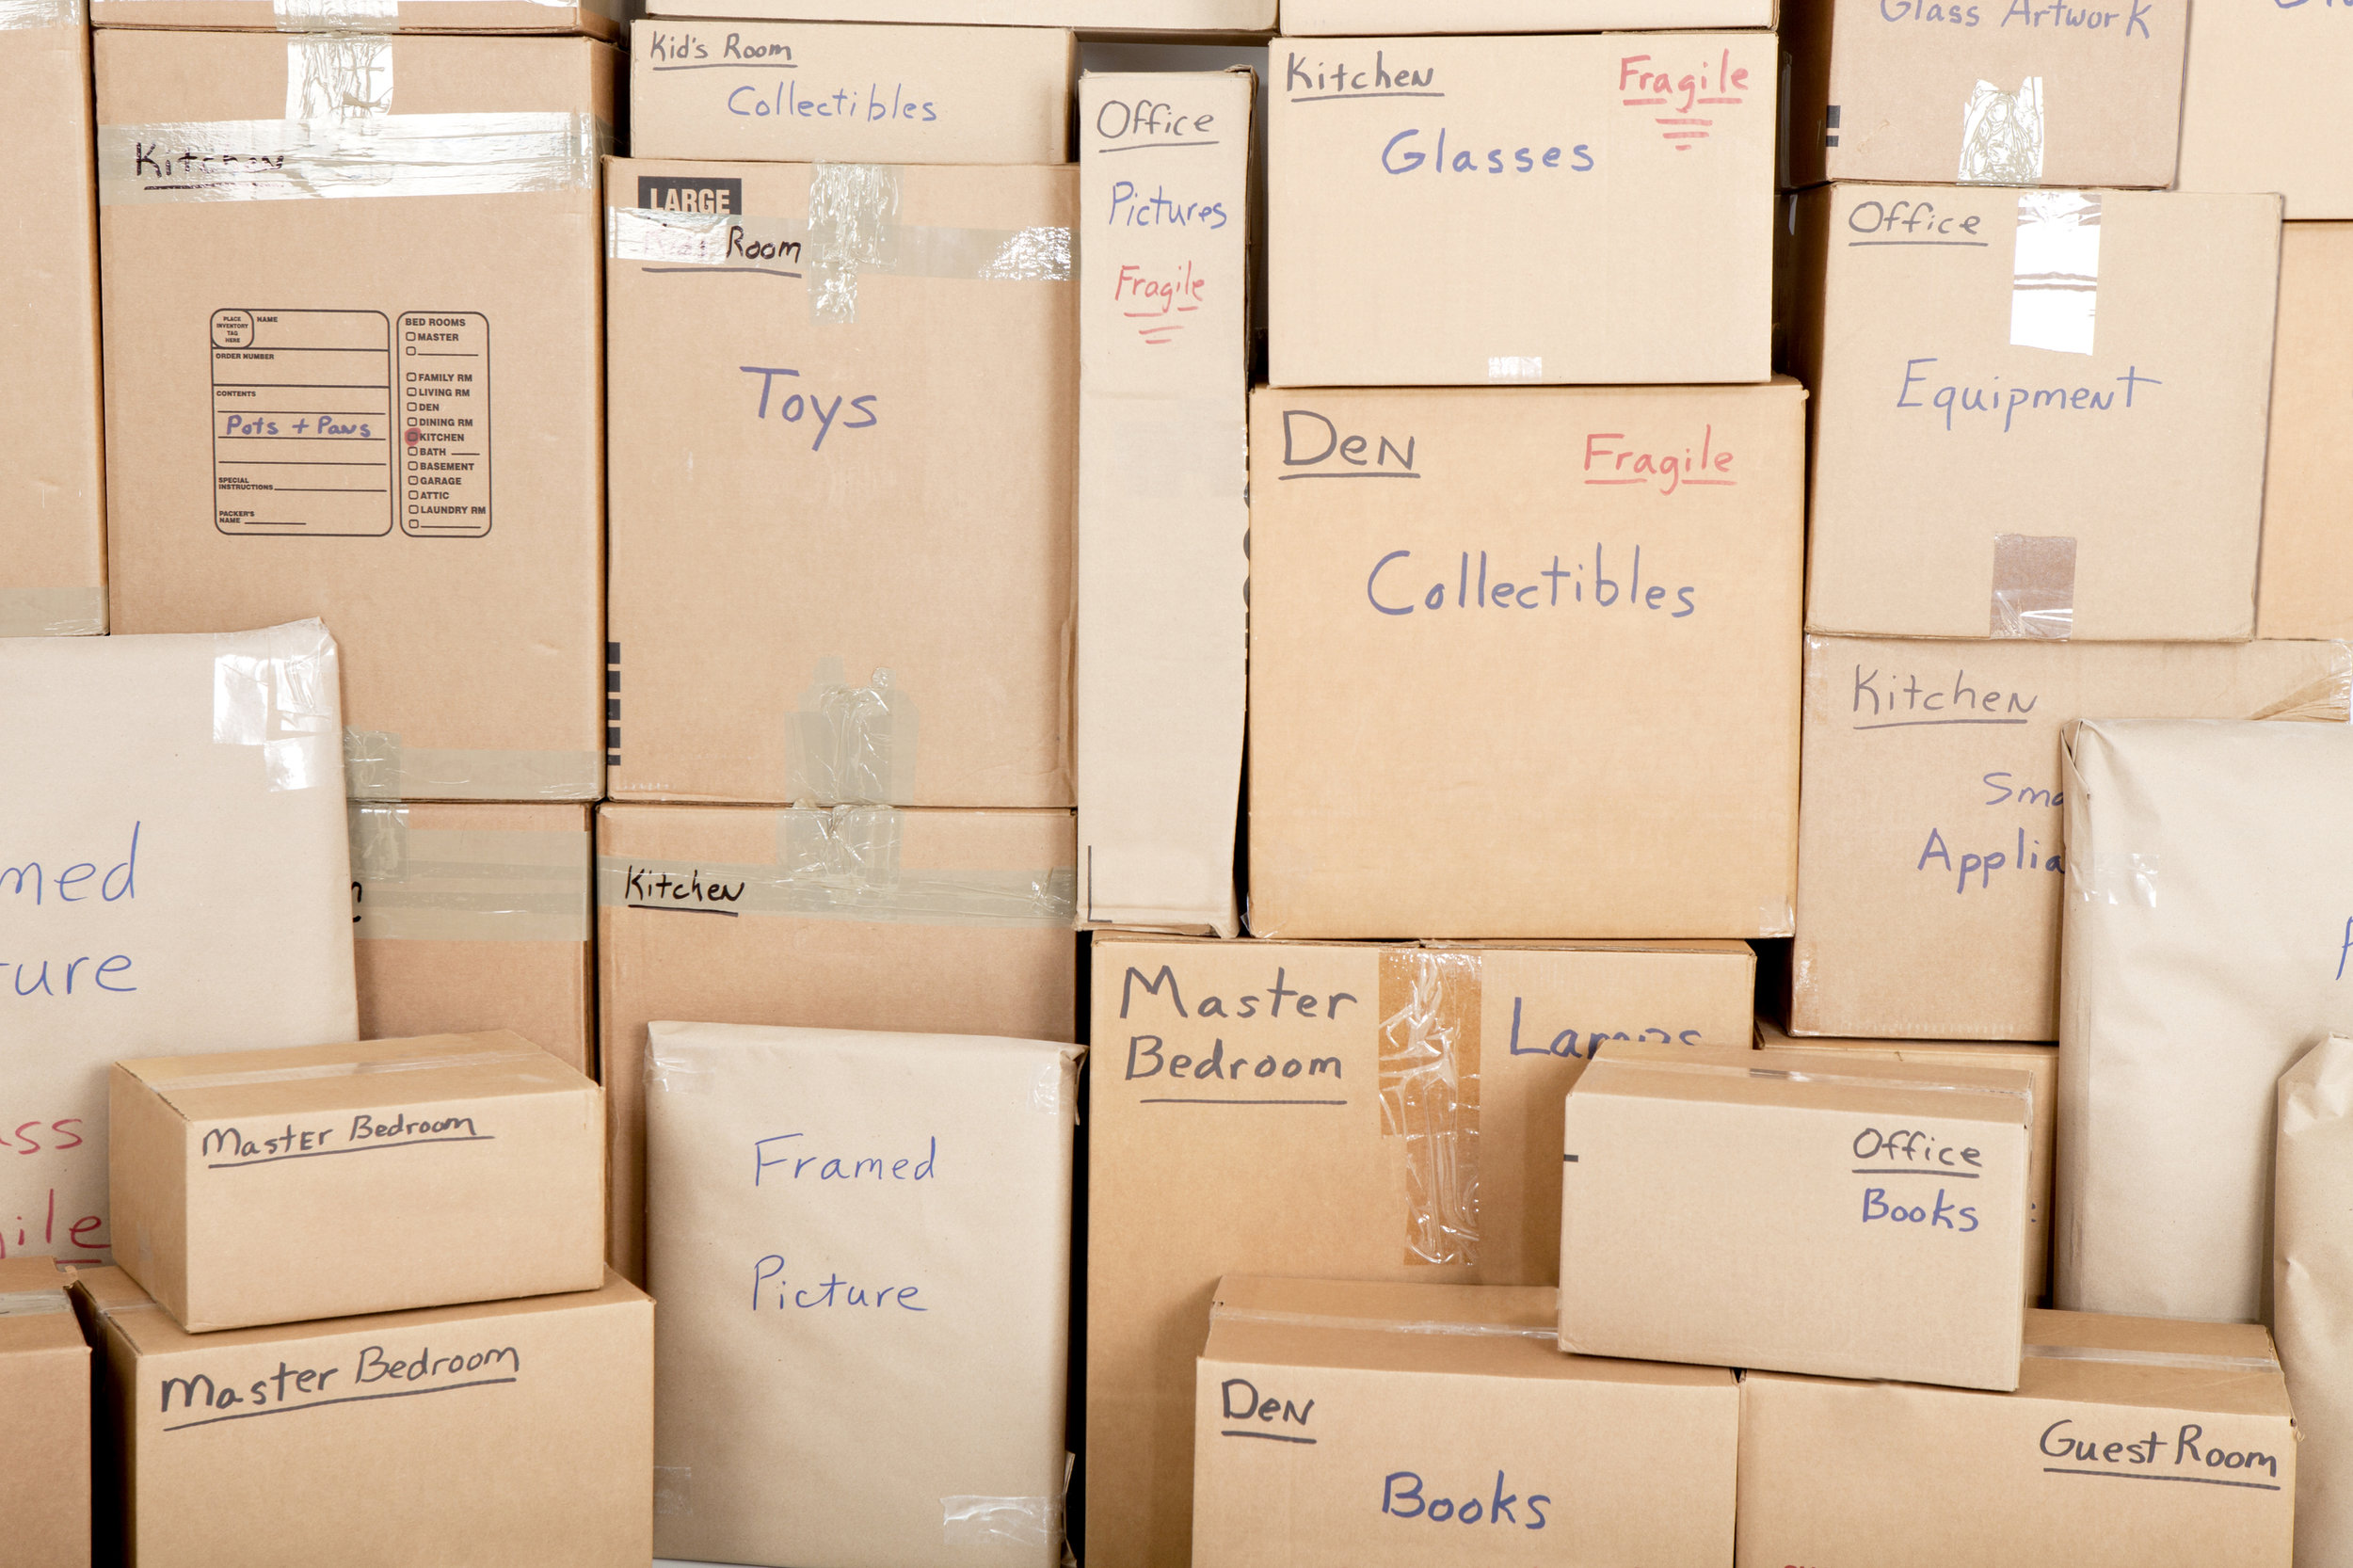 labeledboxes